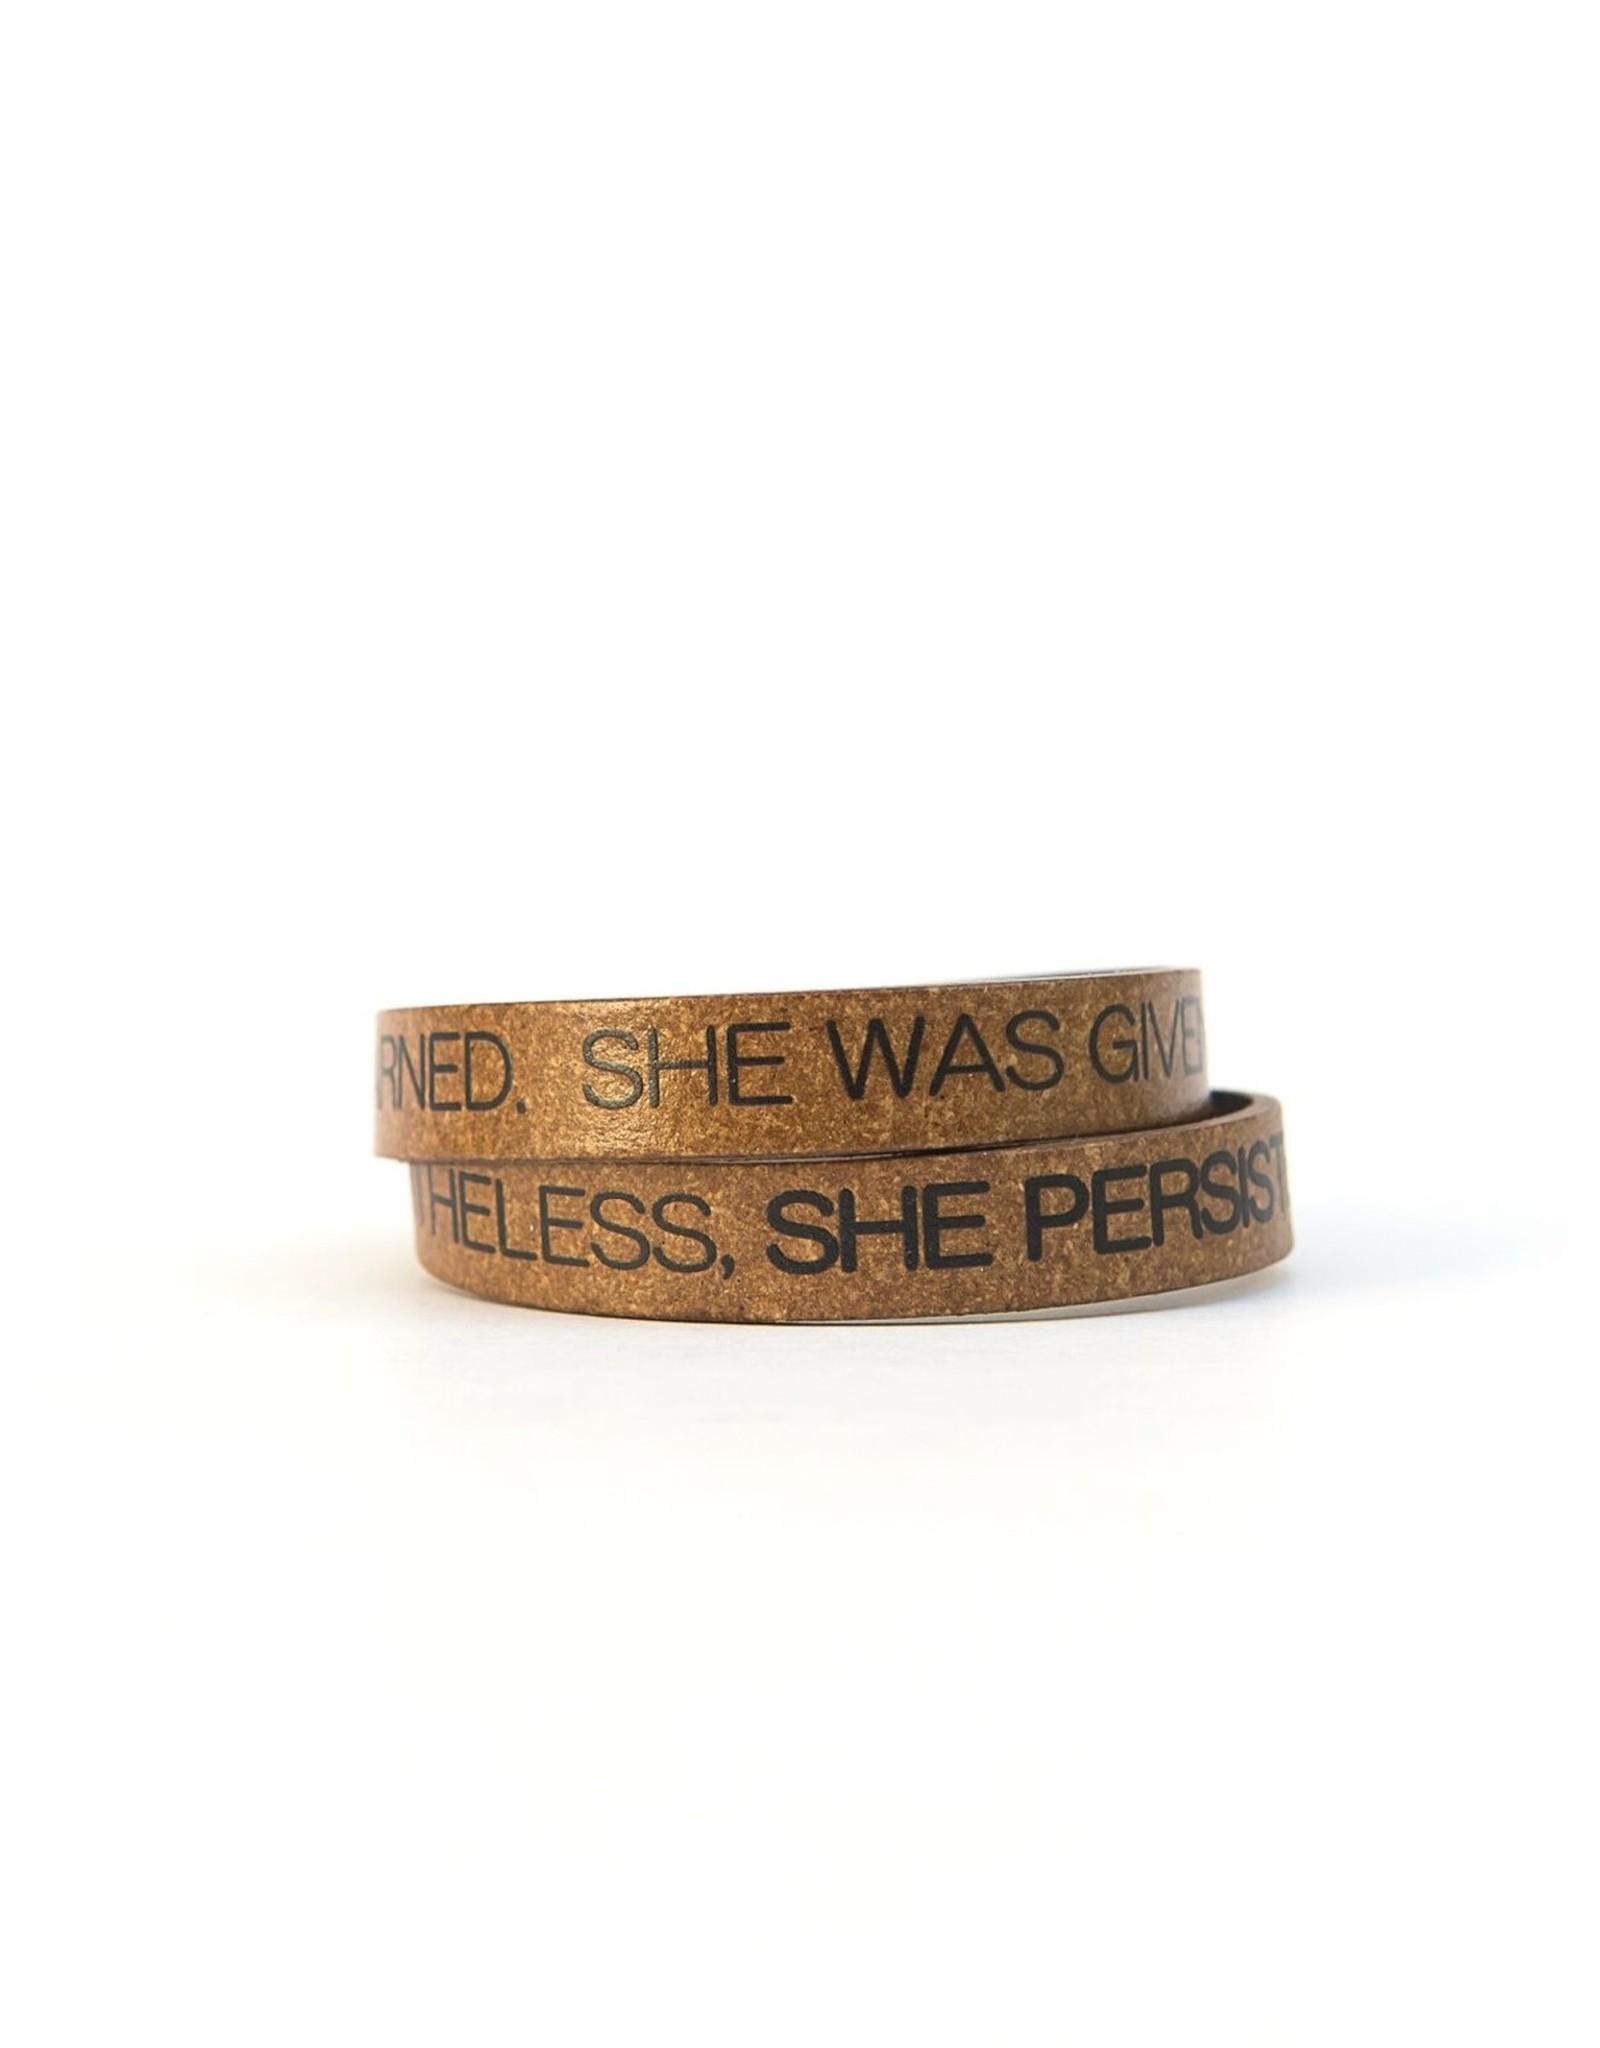 Leather Enscribed Wrap Bracelet She Persisted